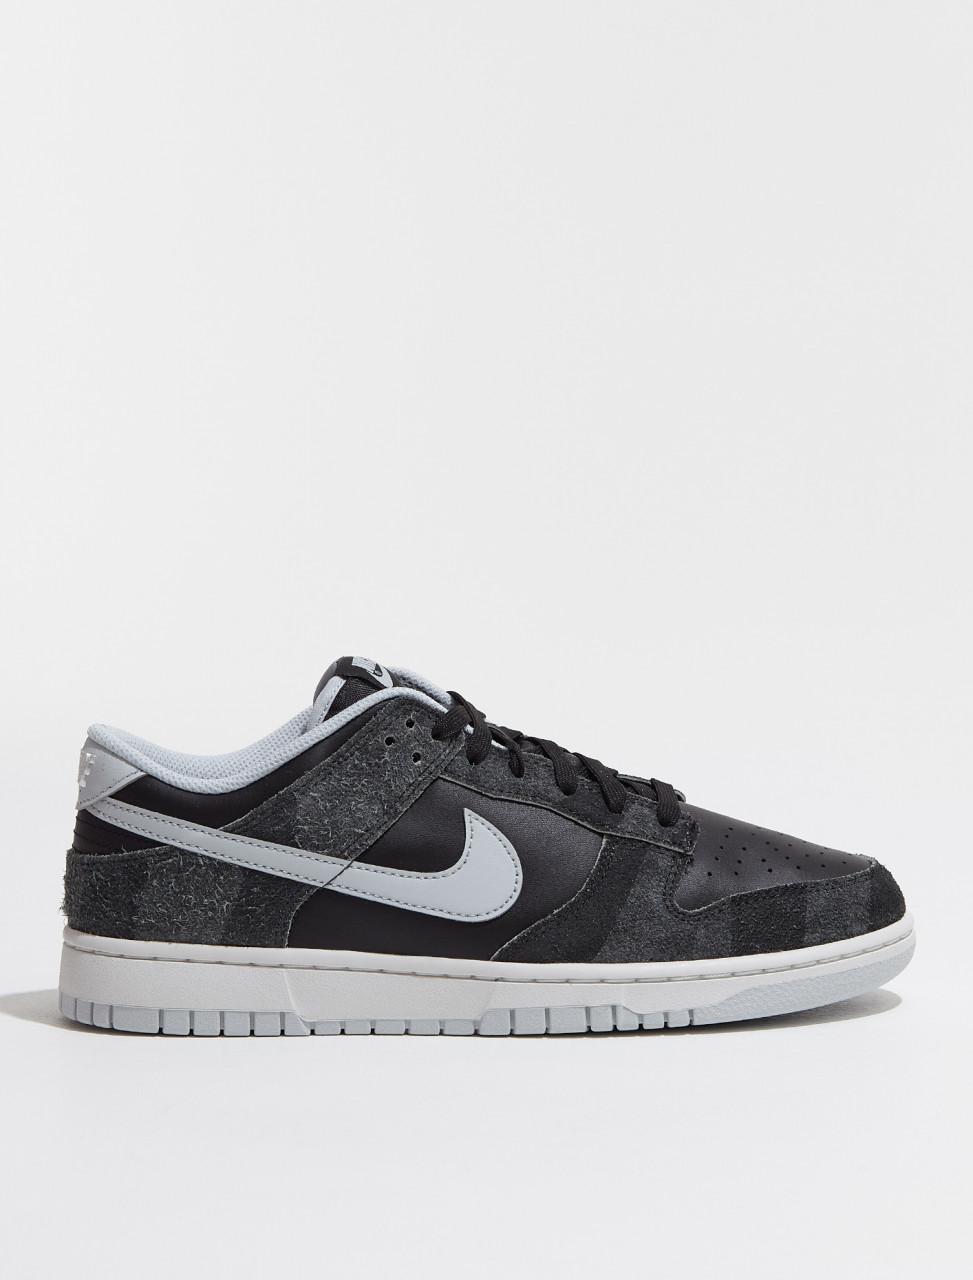 DH7913-001 Nike Dunk Low Animal Pack 'Zebra' Sneaker in Black